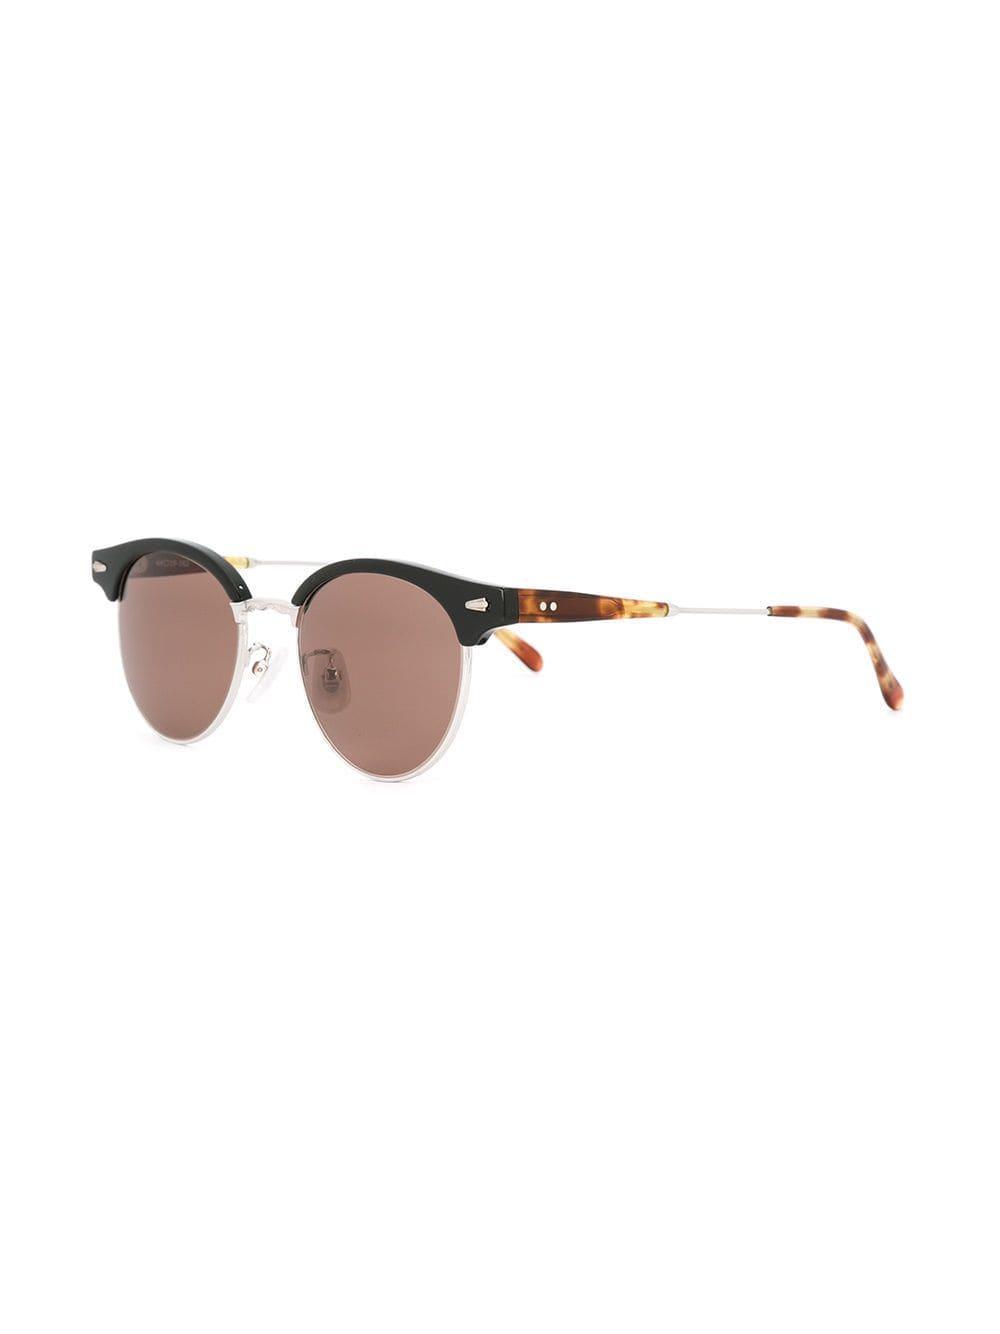 BOSTON CLUB 'austin' Sunglasses in Black